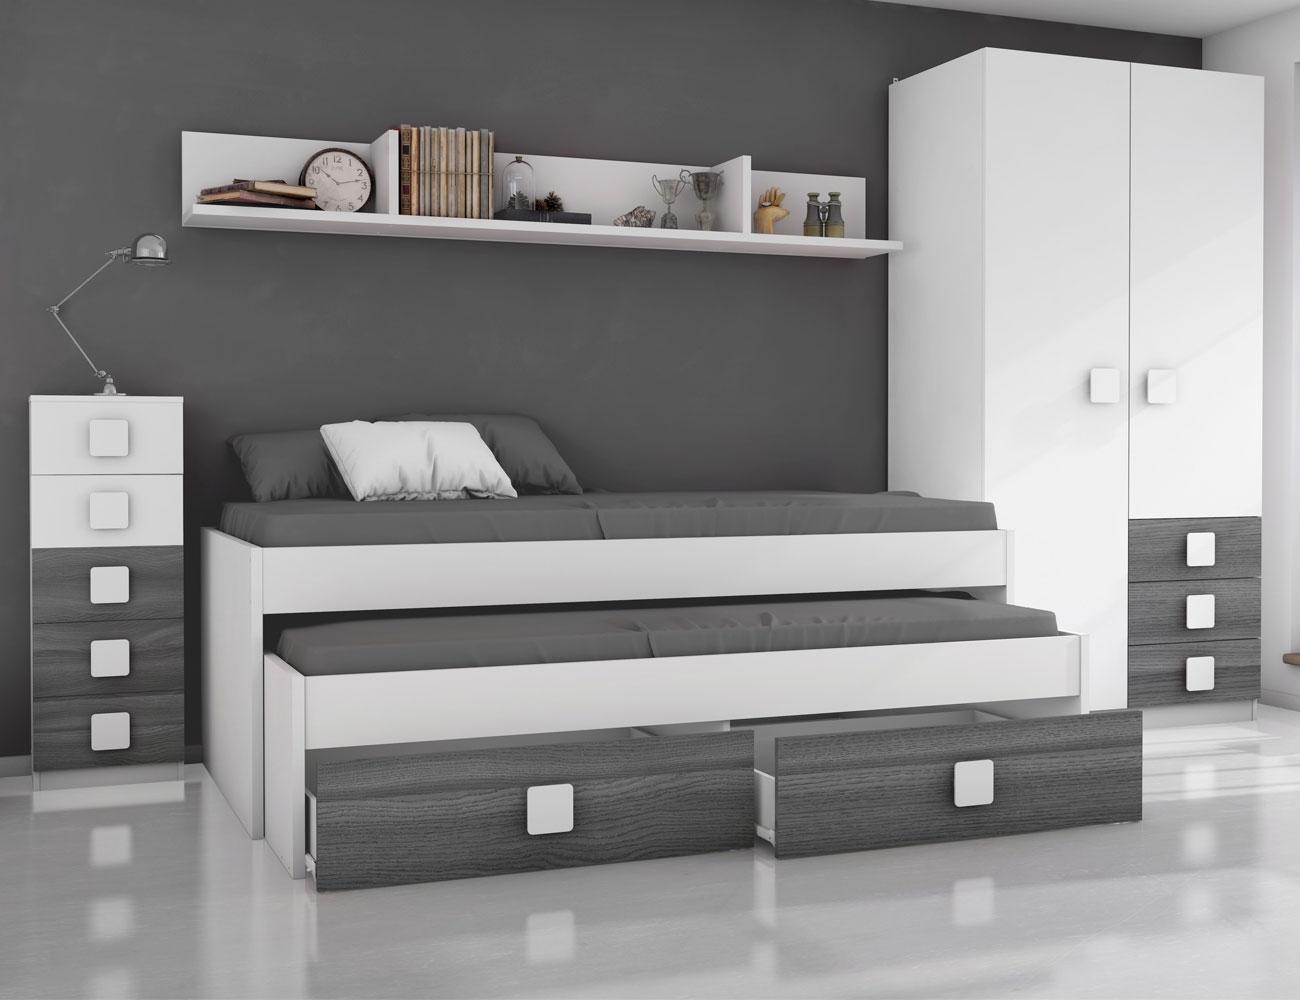 Dormitorio juvenil ceniza blanco2